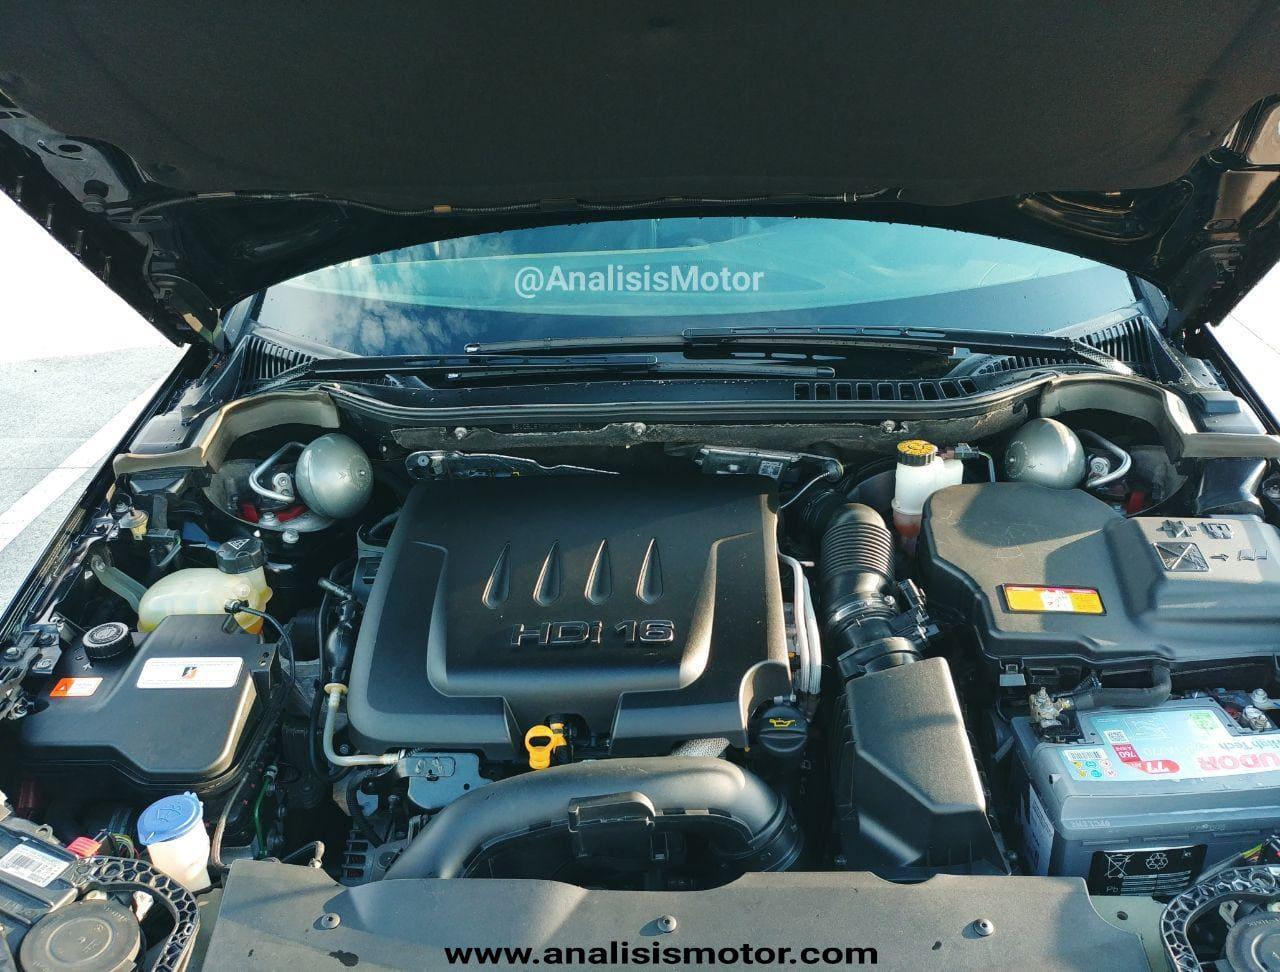 Motor Citröen C5 2.2 HDI